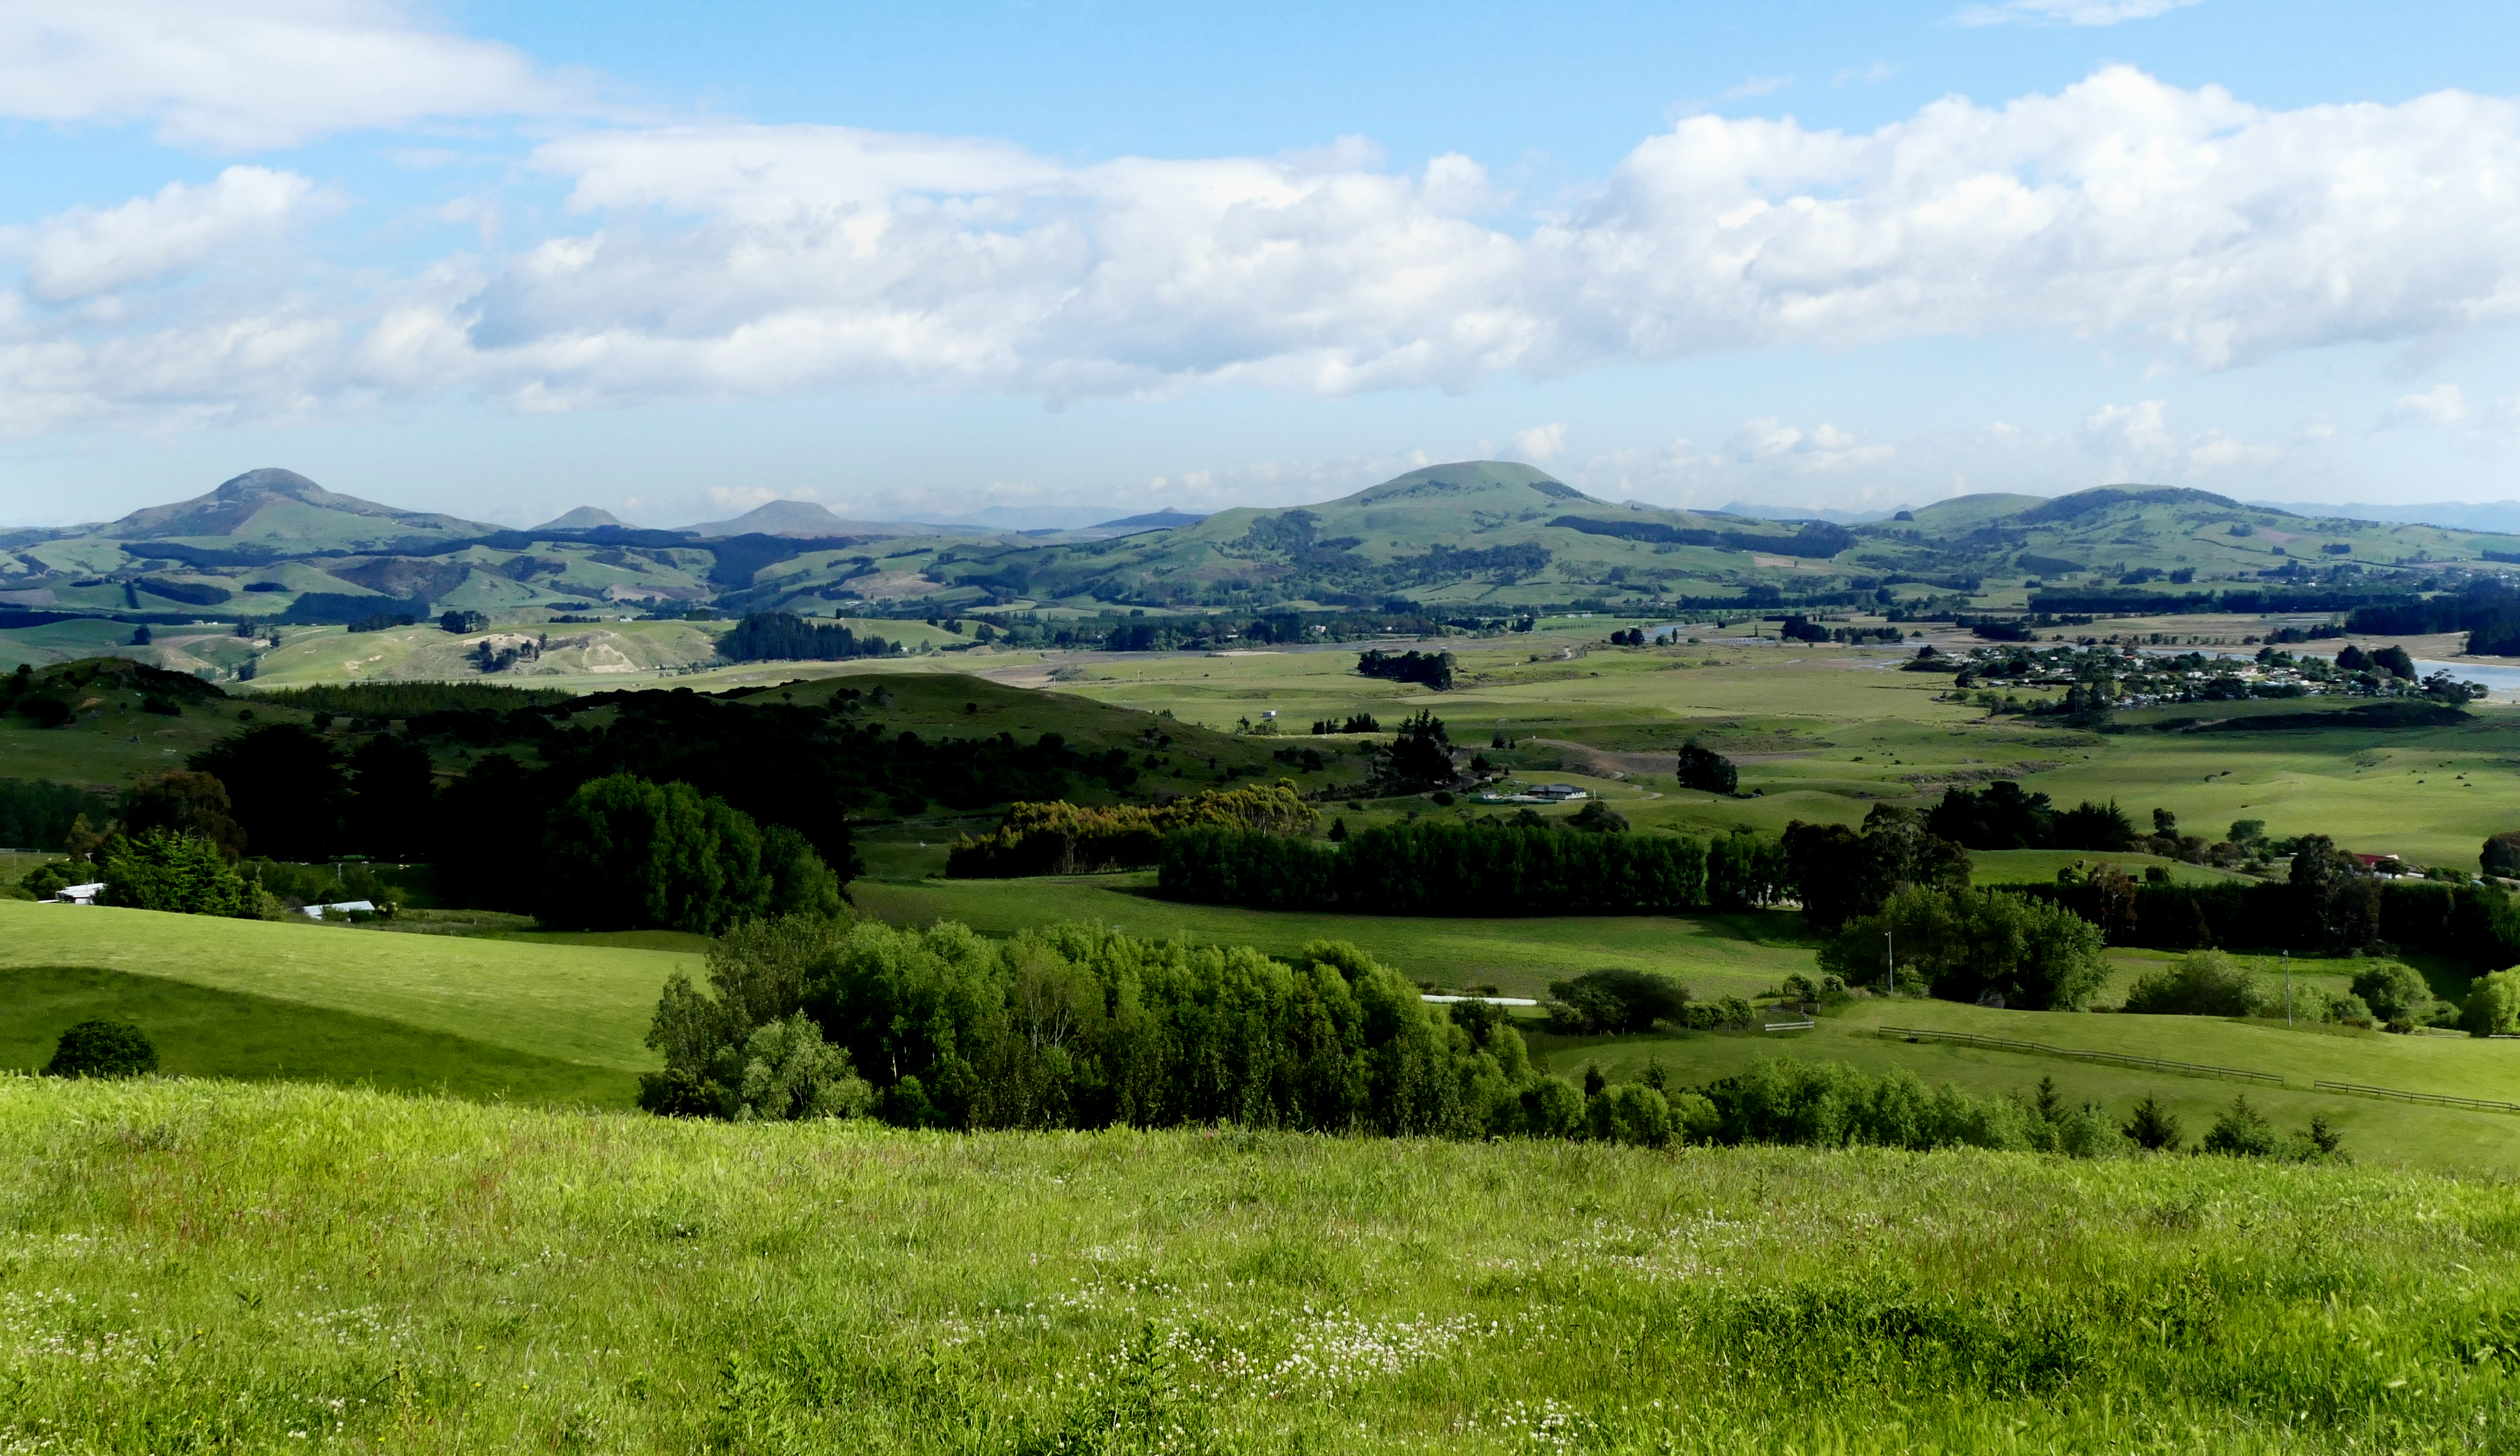 The far hills. otago. photo